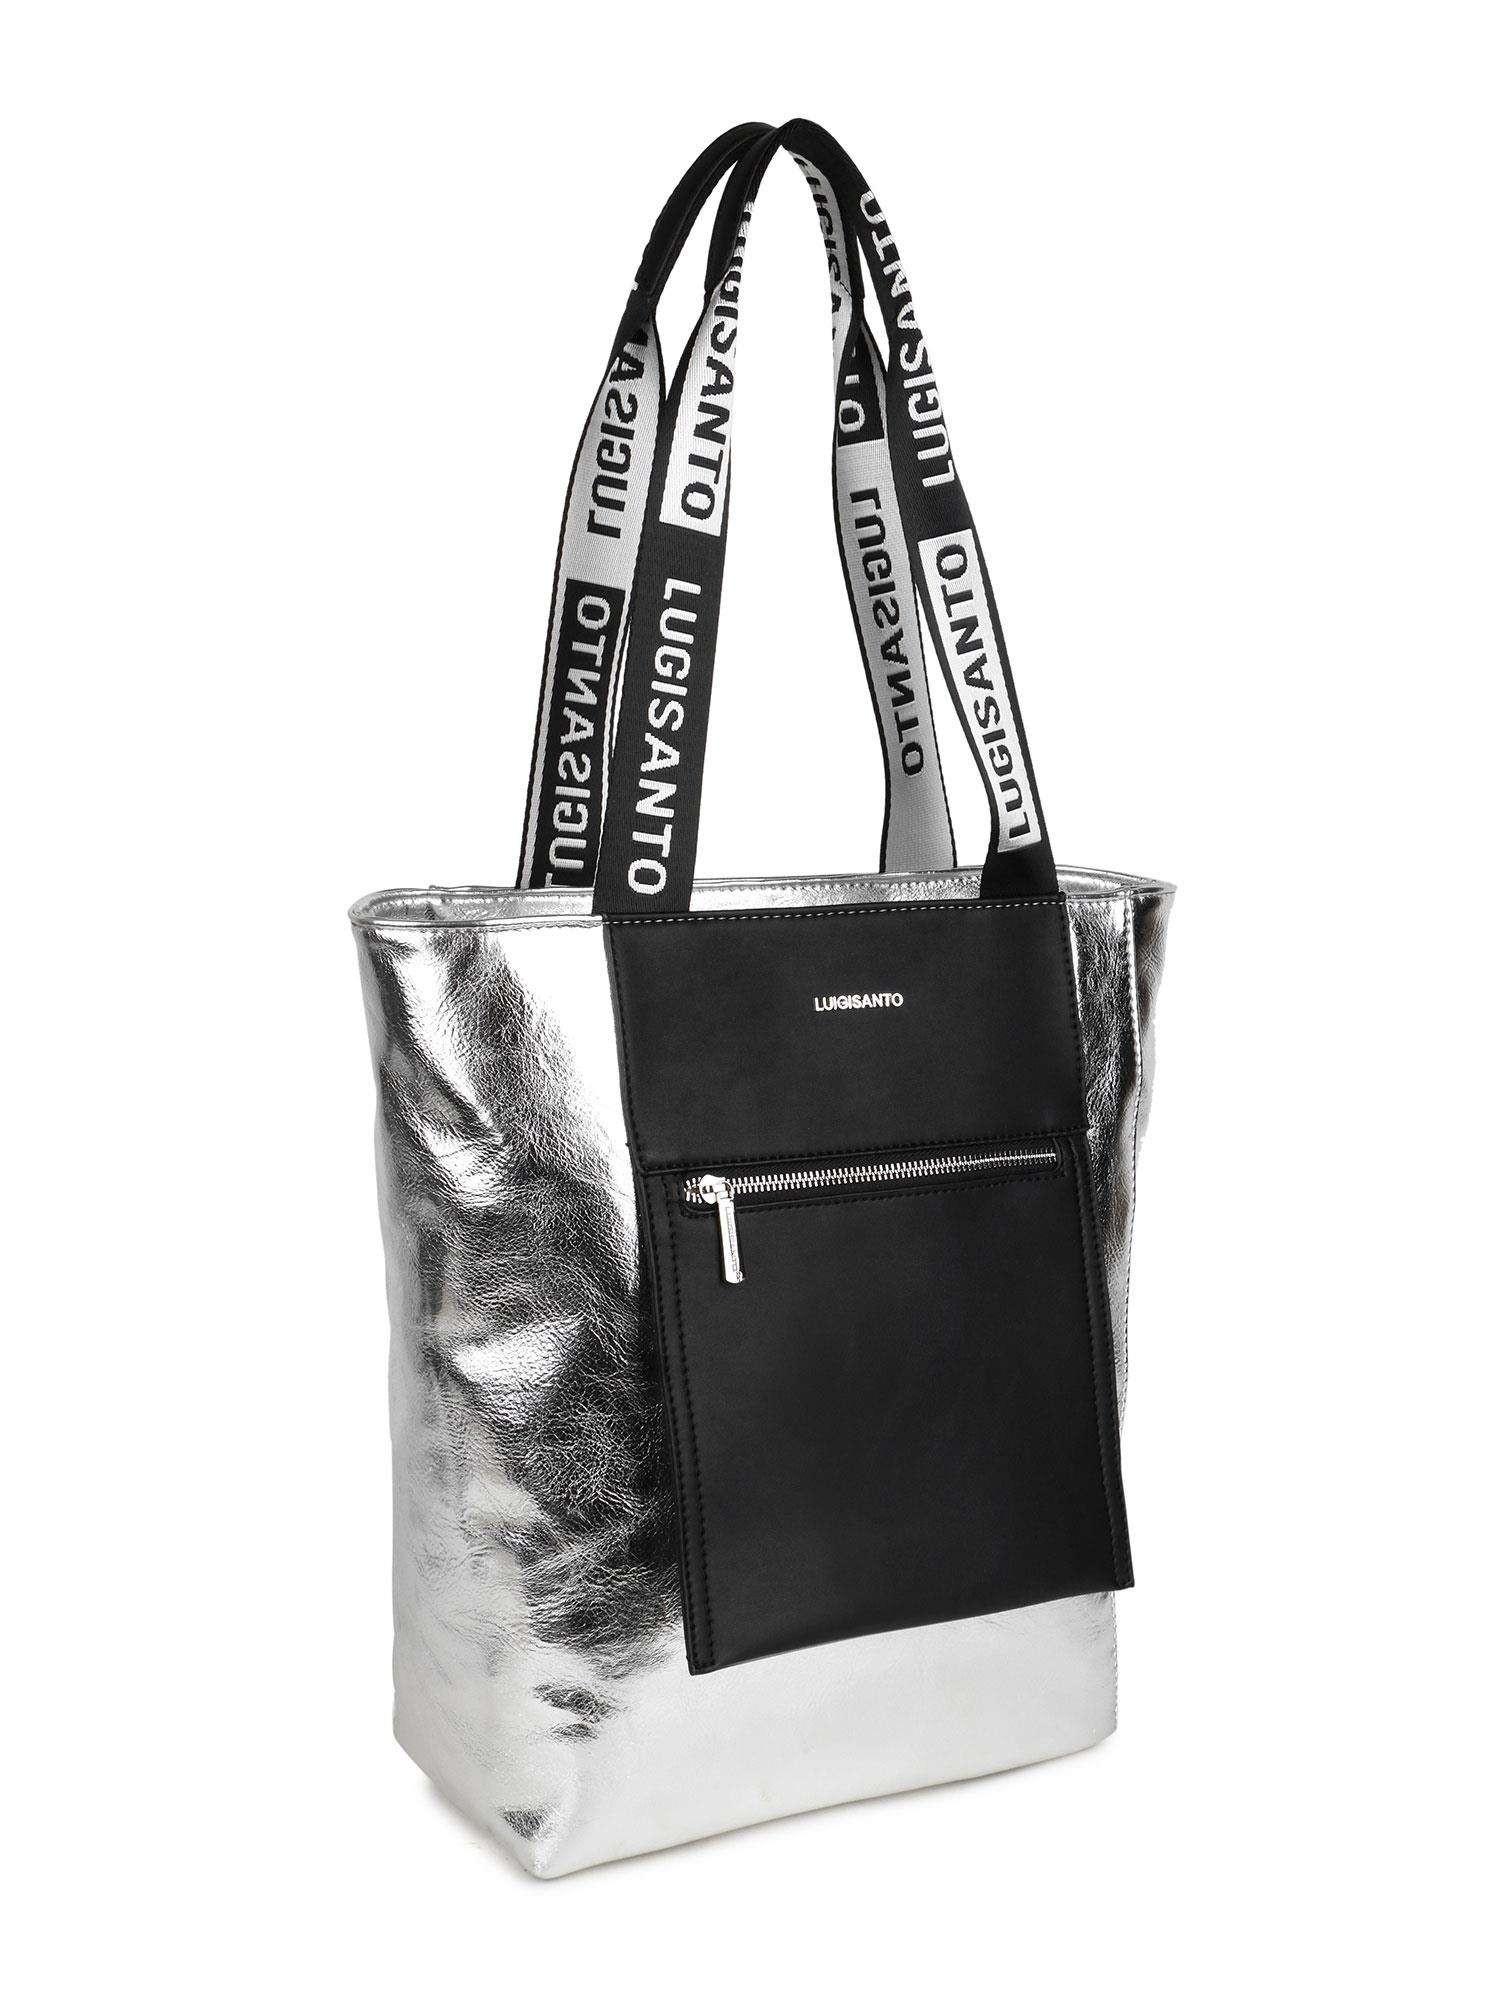 LUIGISANTO Strieborná taška cez rameno one size